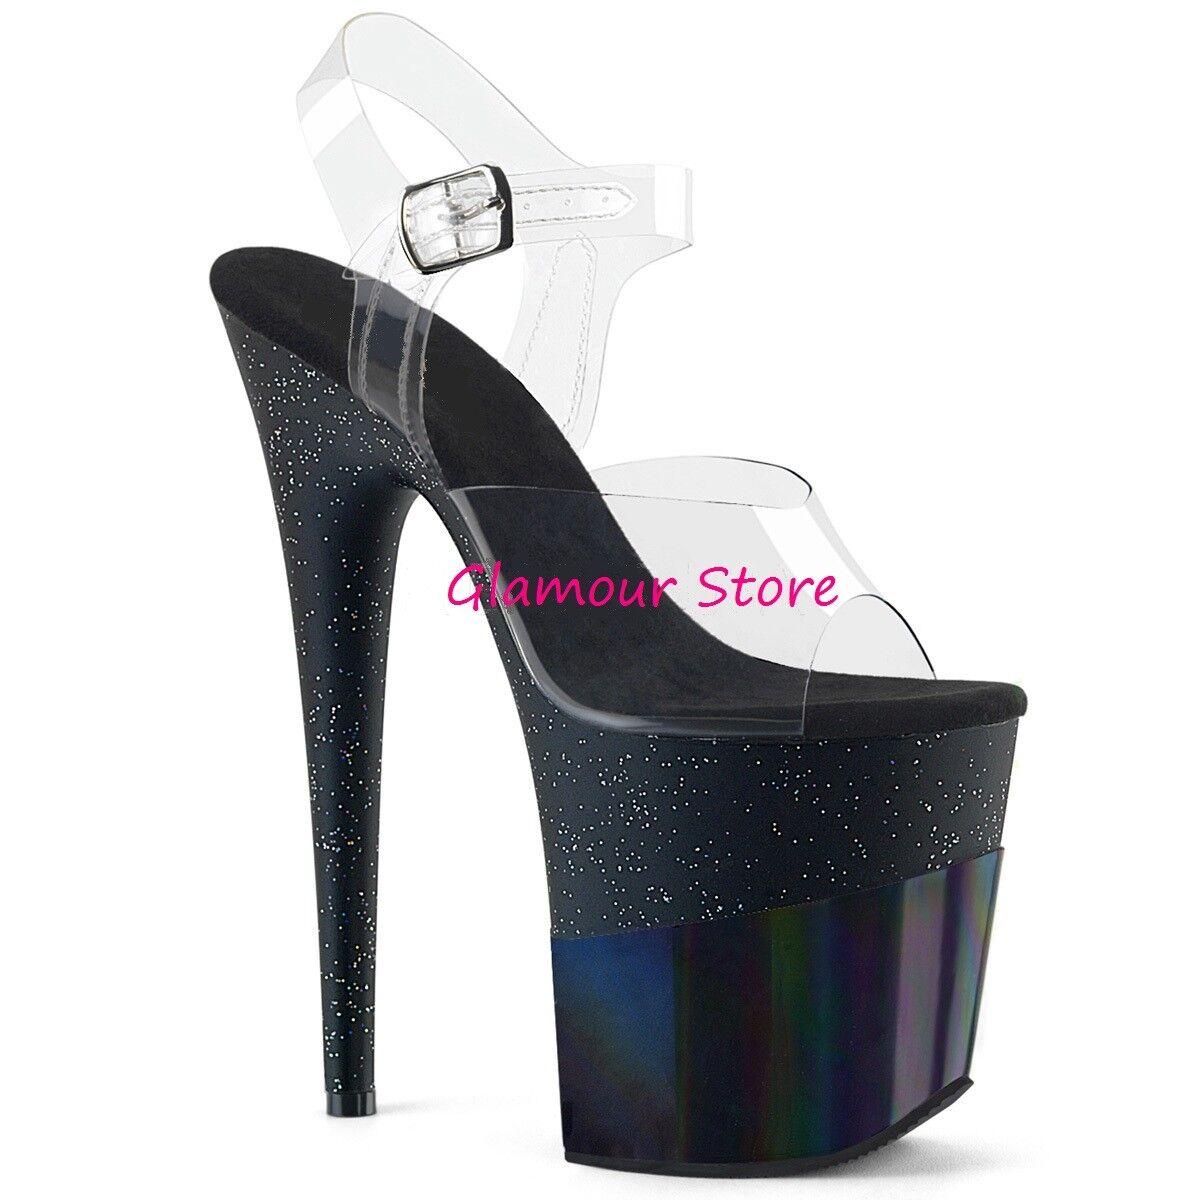 Sexy SANDALI GLITTER tacco 20 negro TRASPARENTE dal 35 al 40 plateau zapatos club